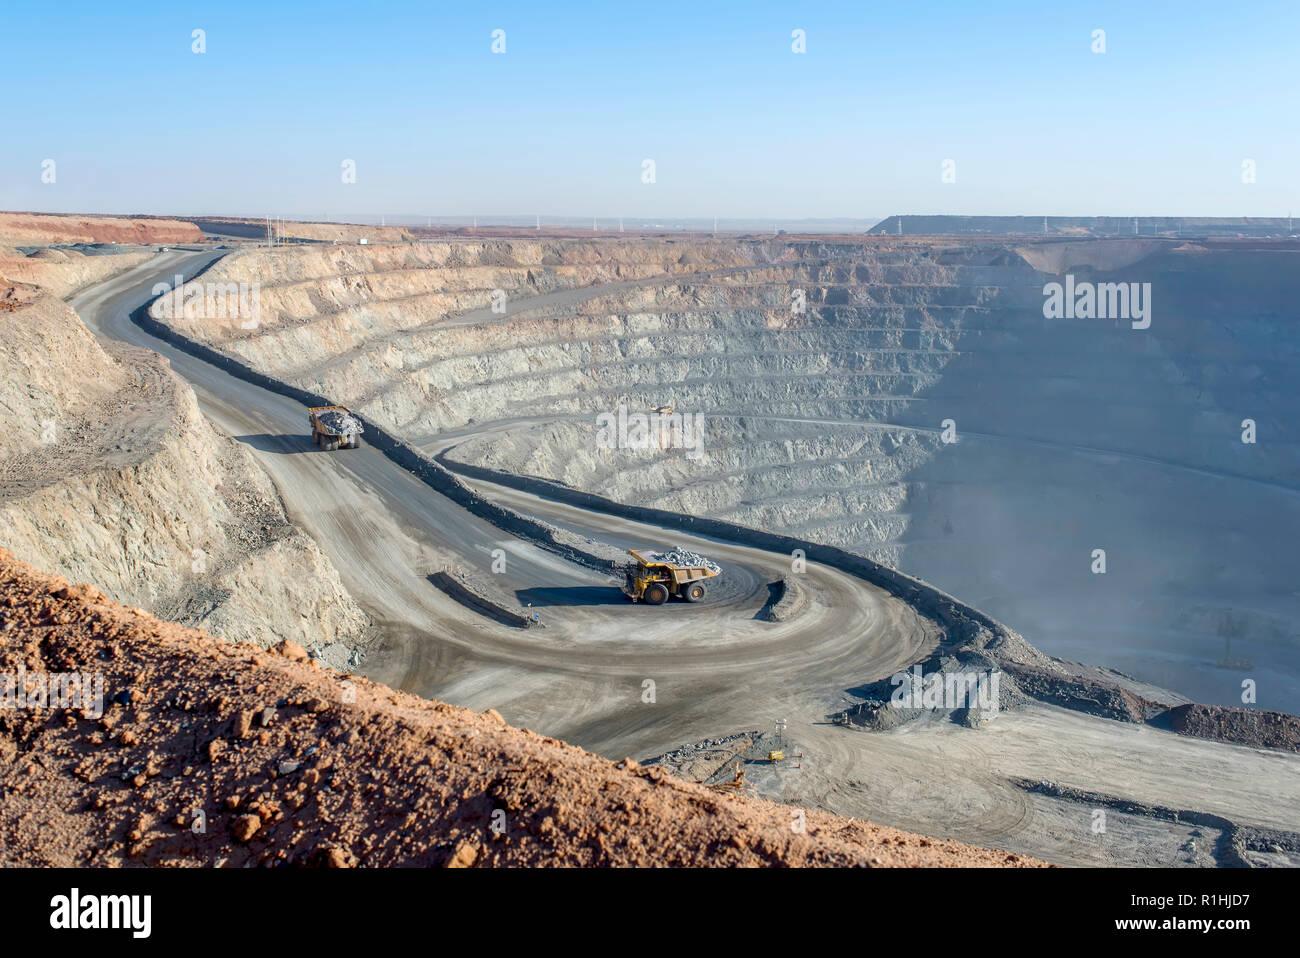 open pit mine in Mongolia, hauling trucks - Stock Image